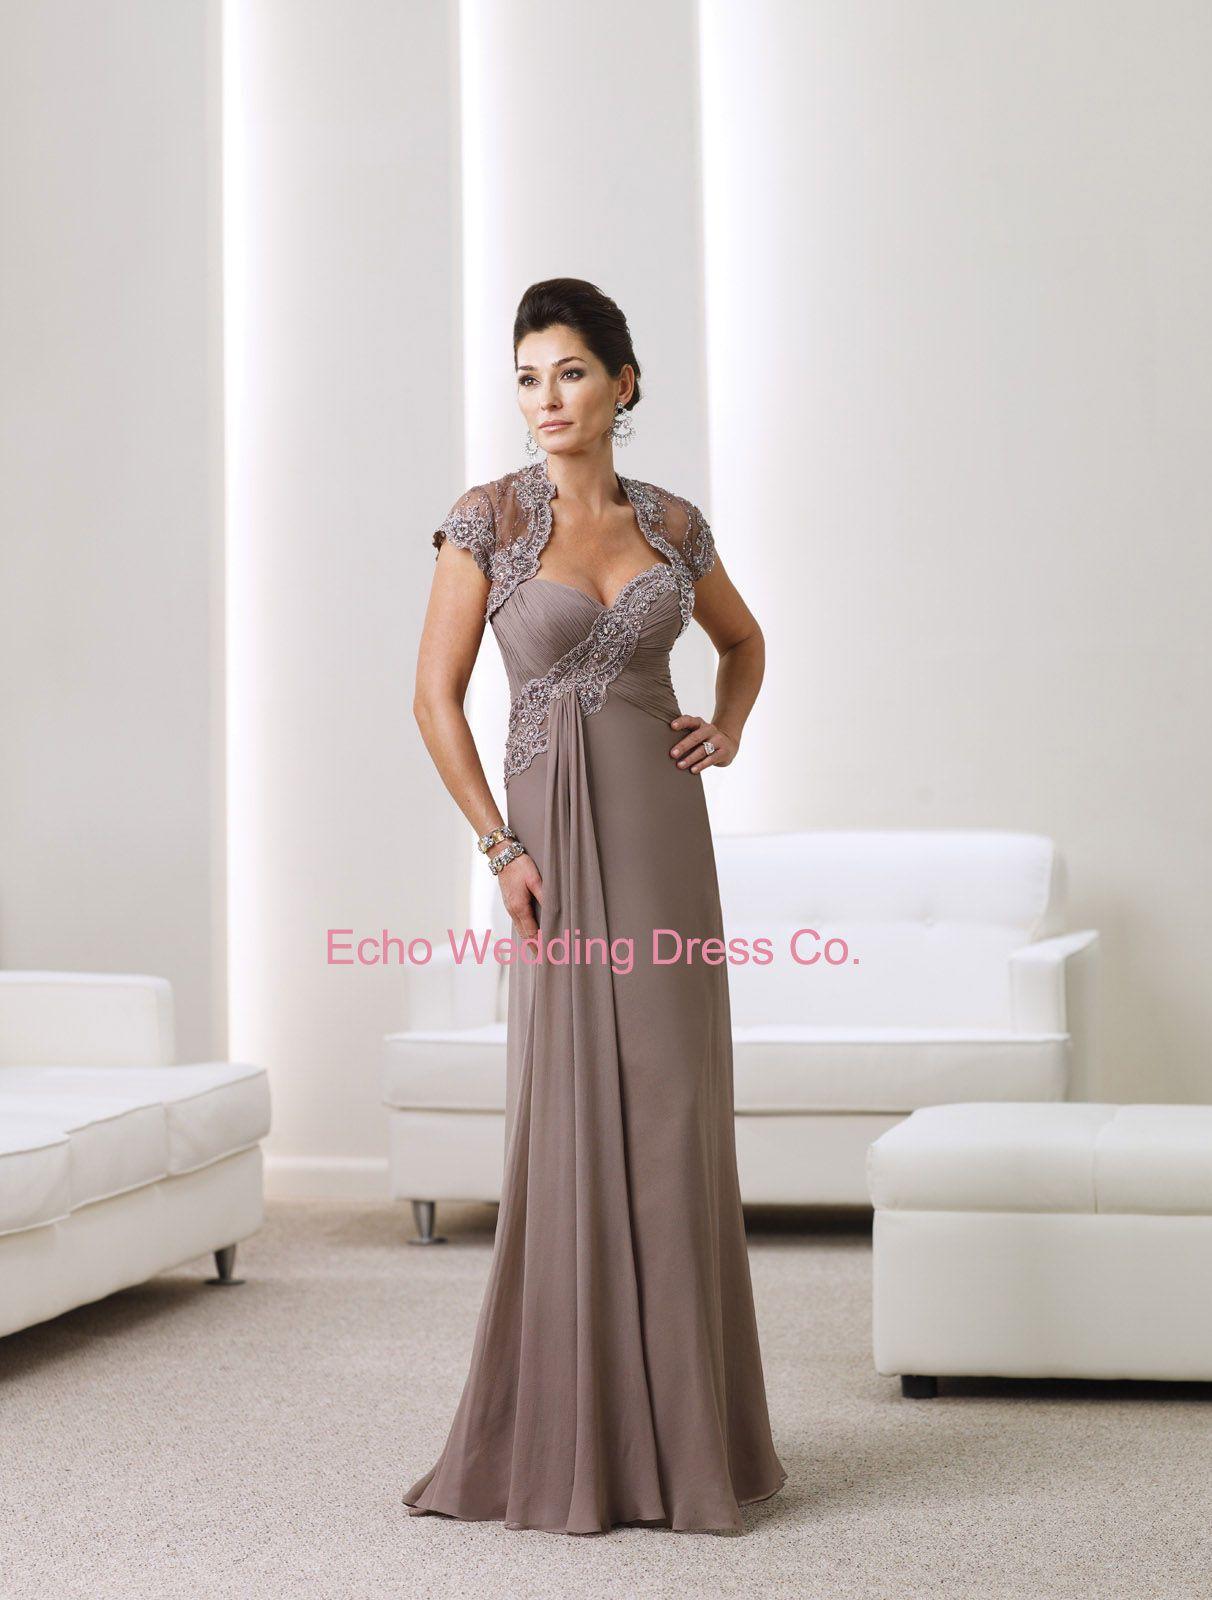 Dresses to wear to a beach wedding as a guest  motherofbridebeachweddingdressesdillardsg